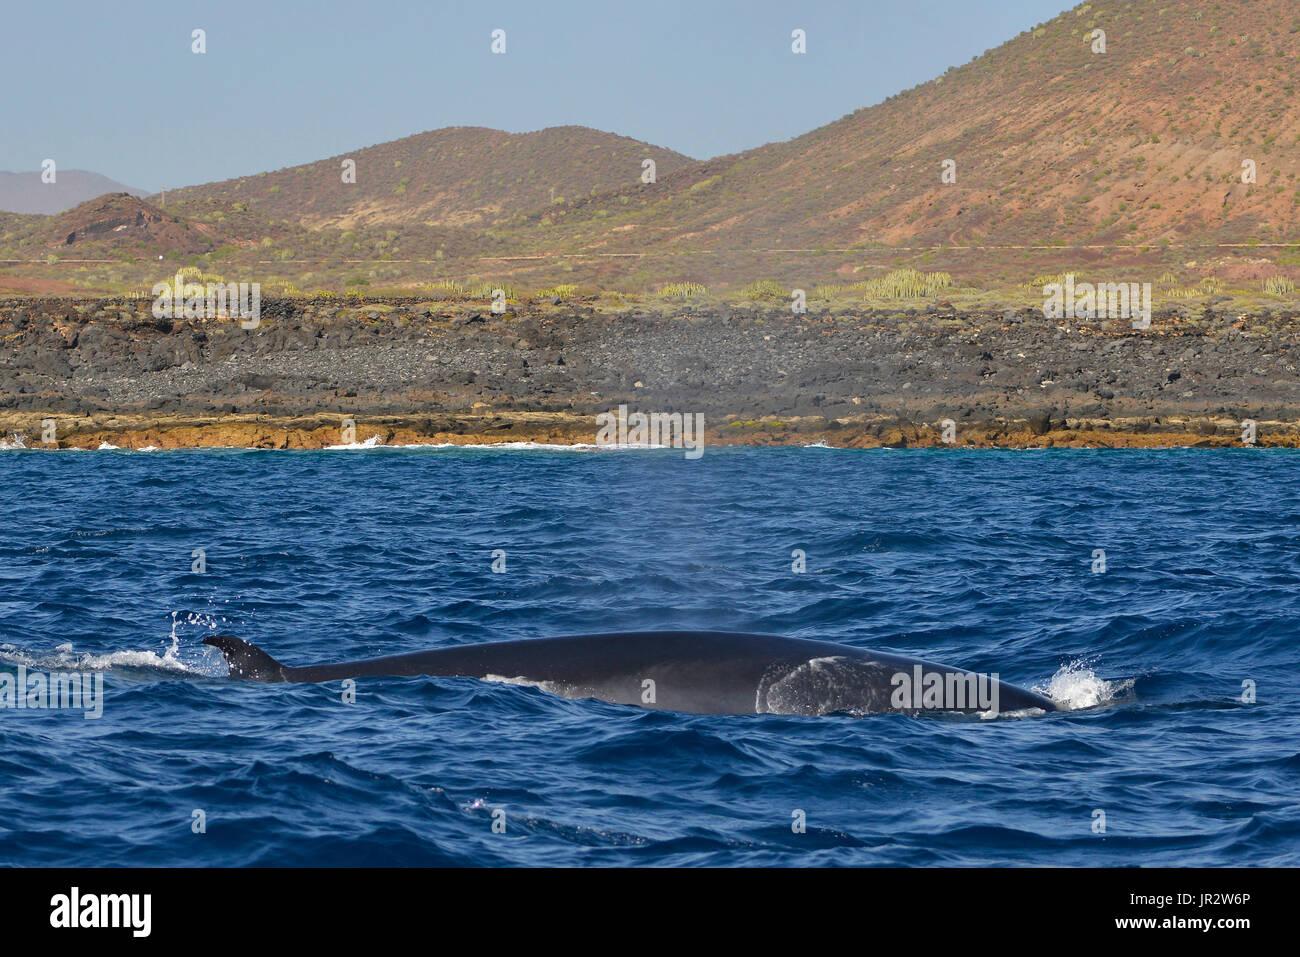 Bryde's whale (Balaenoptera brydei, edeni), Coast of Punta Rasca, Tenerife, Canary Islands. - Stock Image